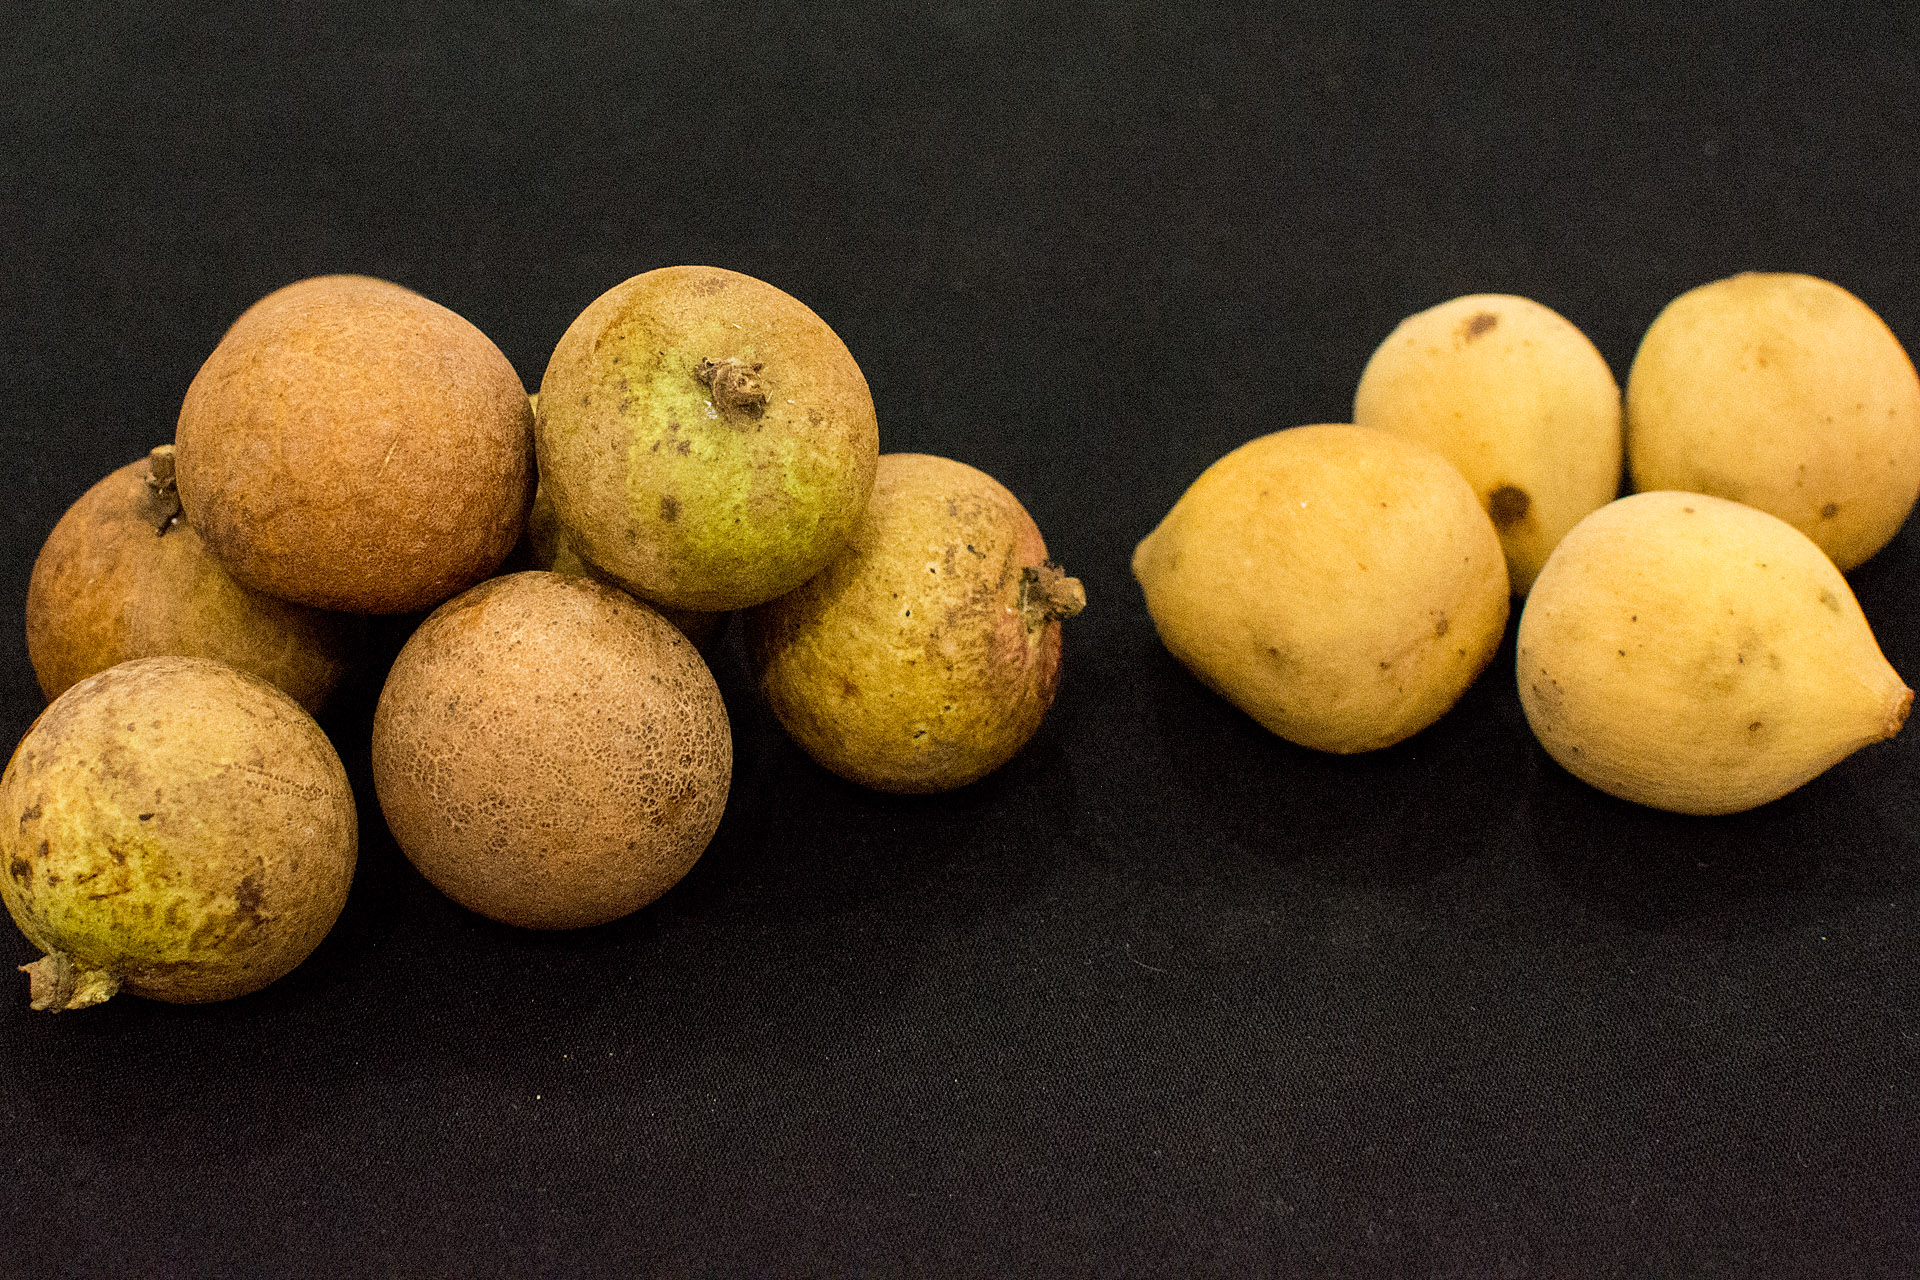 Longan & langsat fruit